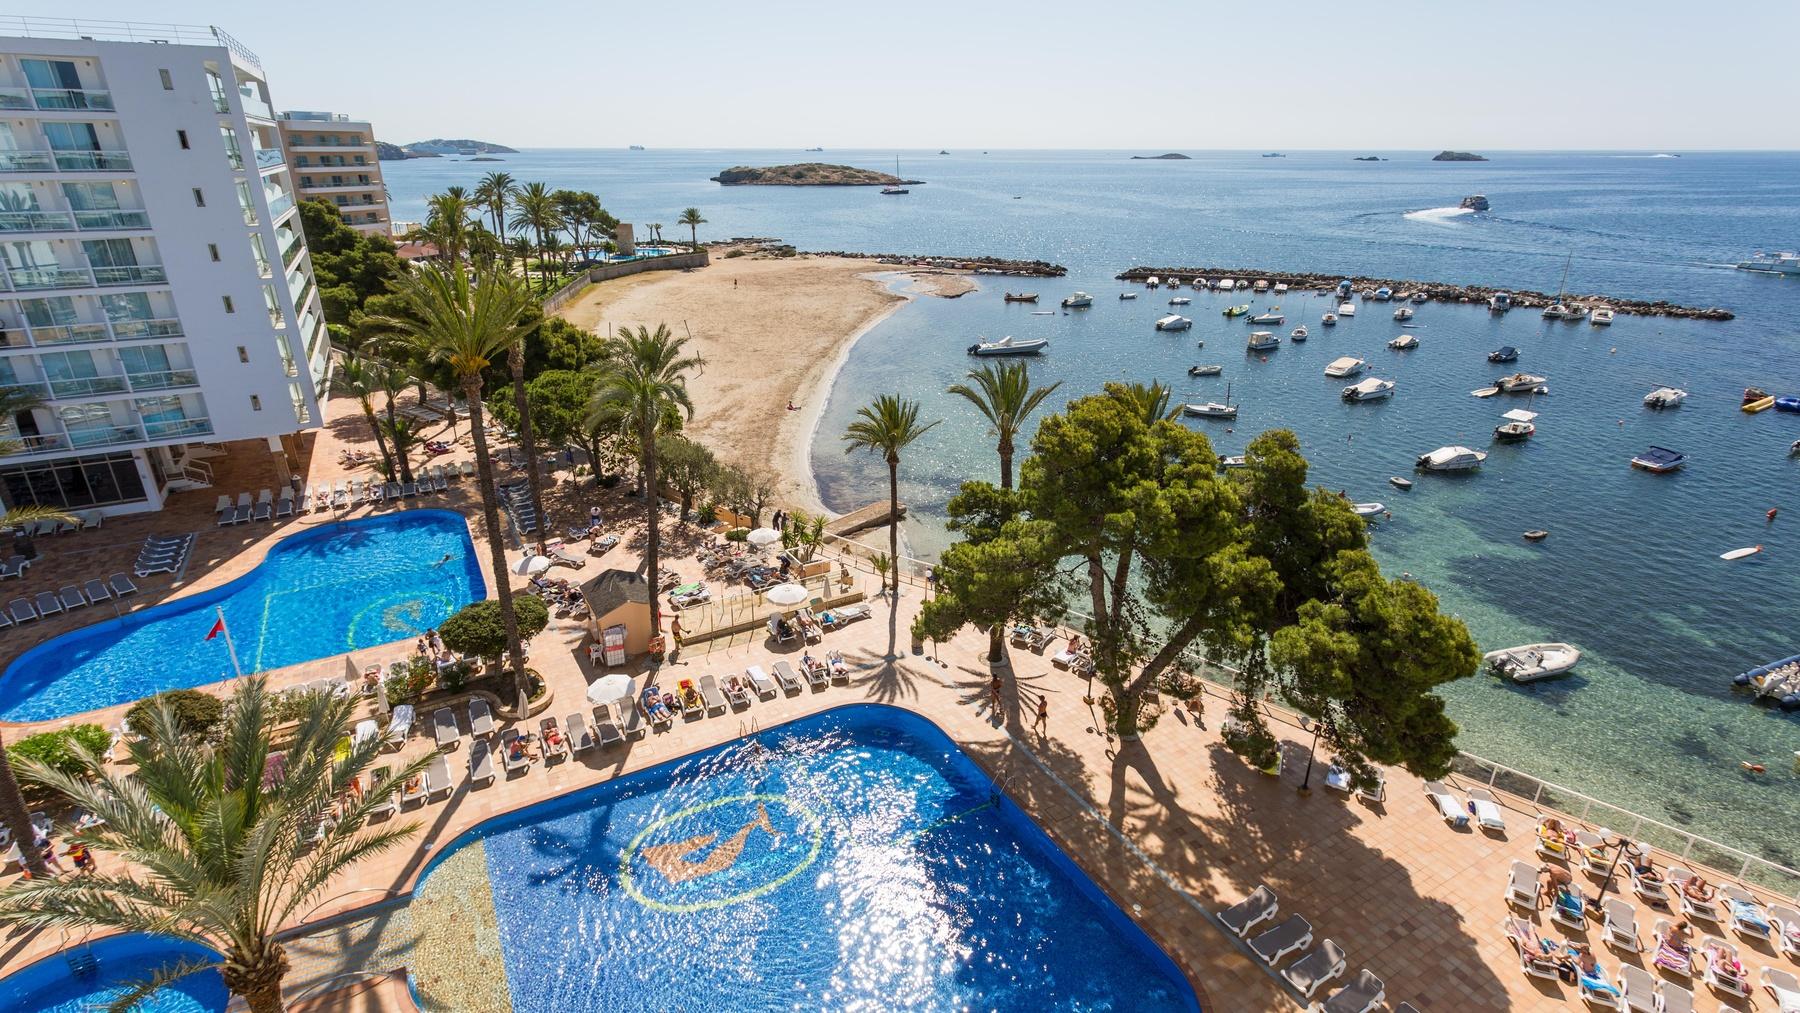 Hotel Goleta Playa D En Bossa